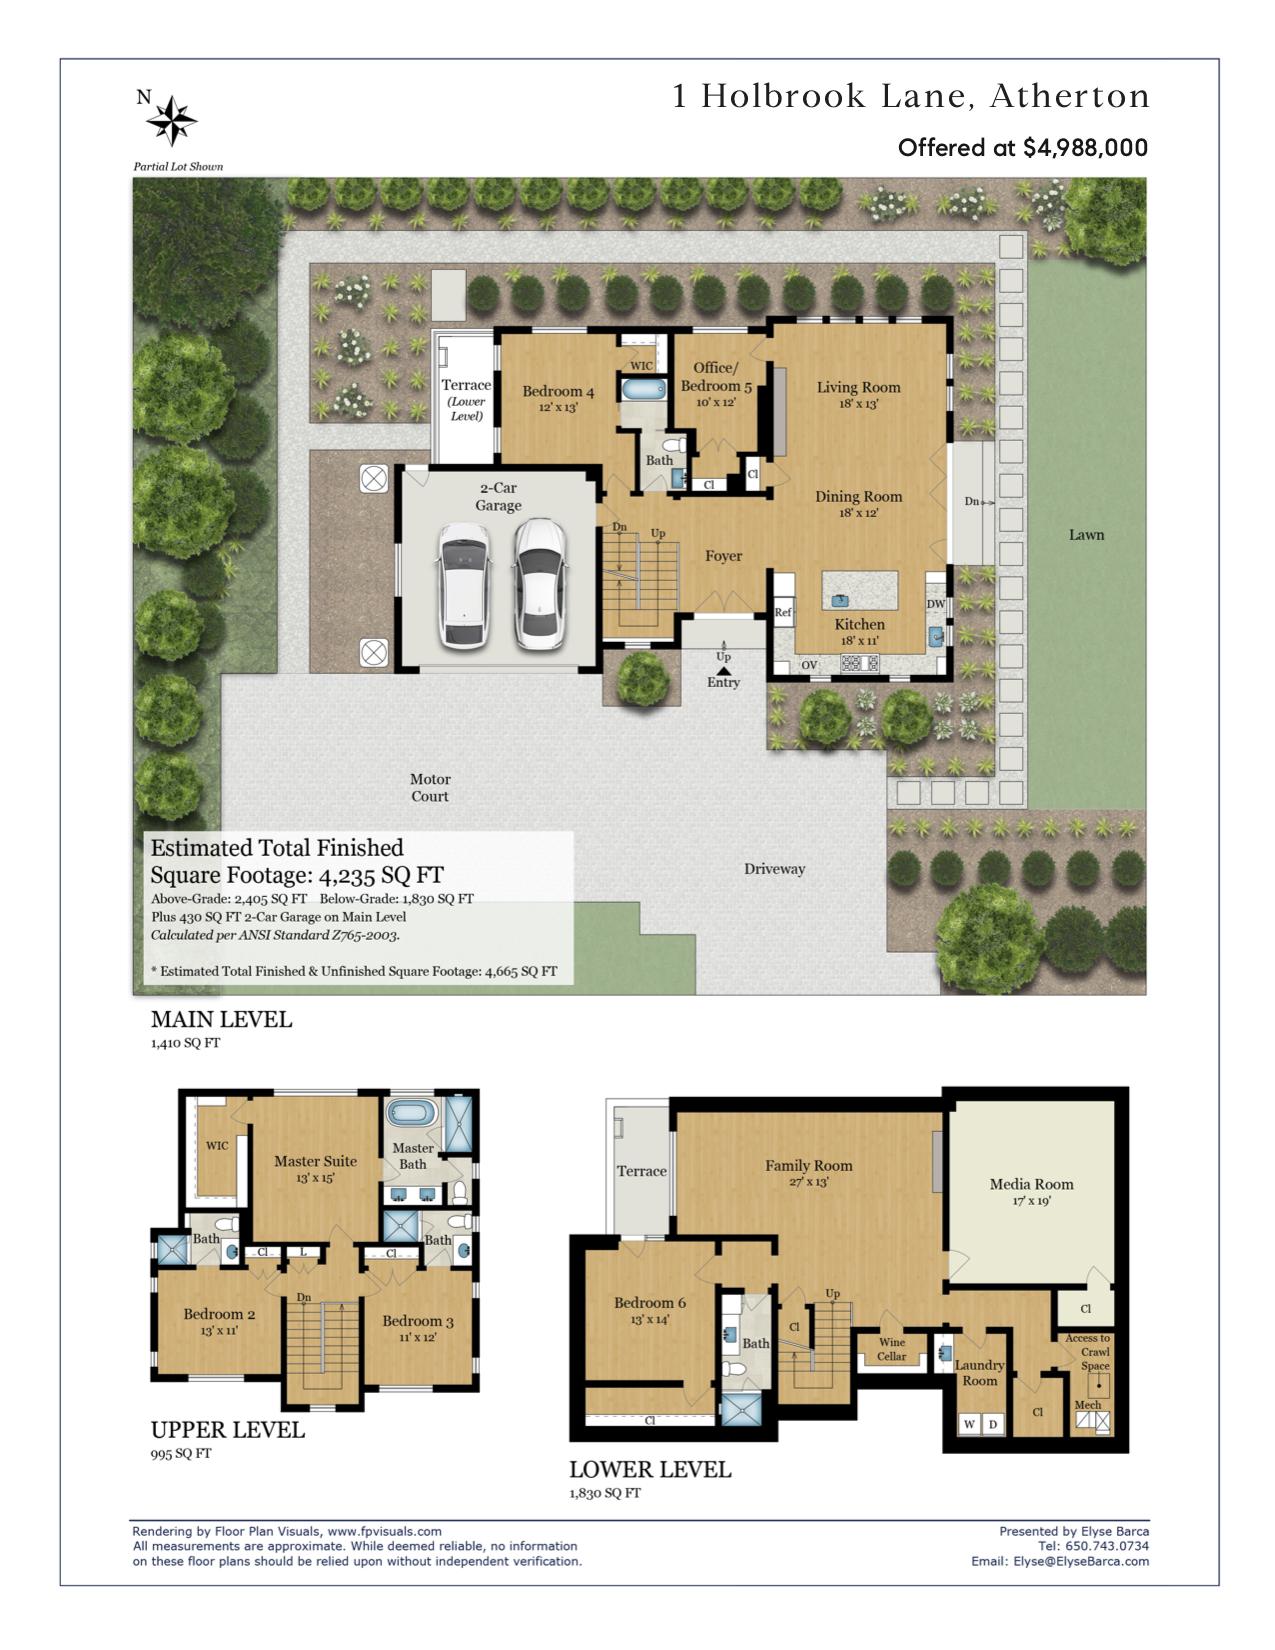 floorplan with price 2019-09-06.jpg